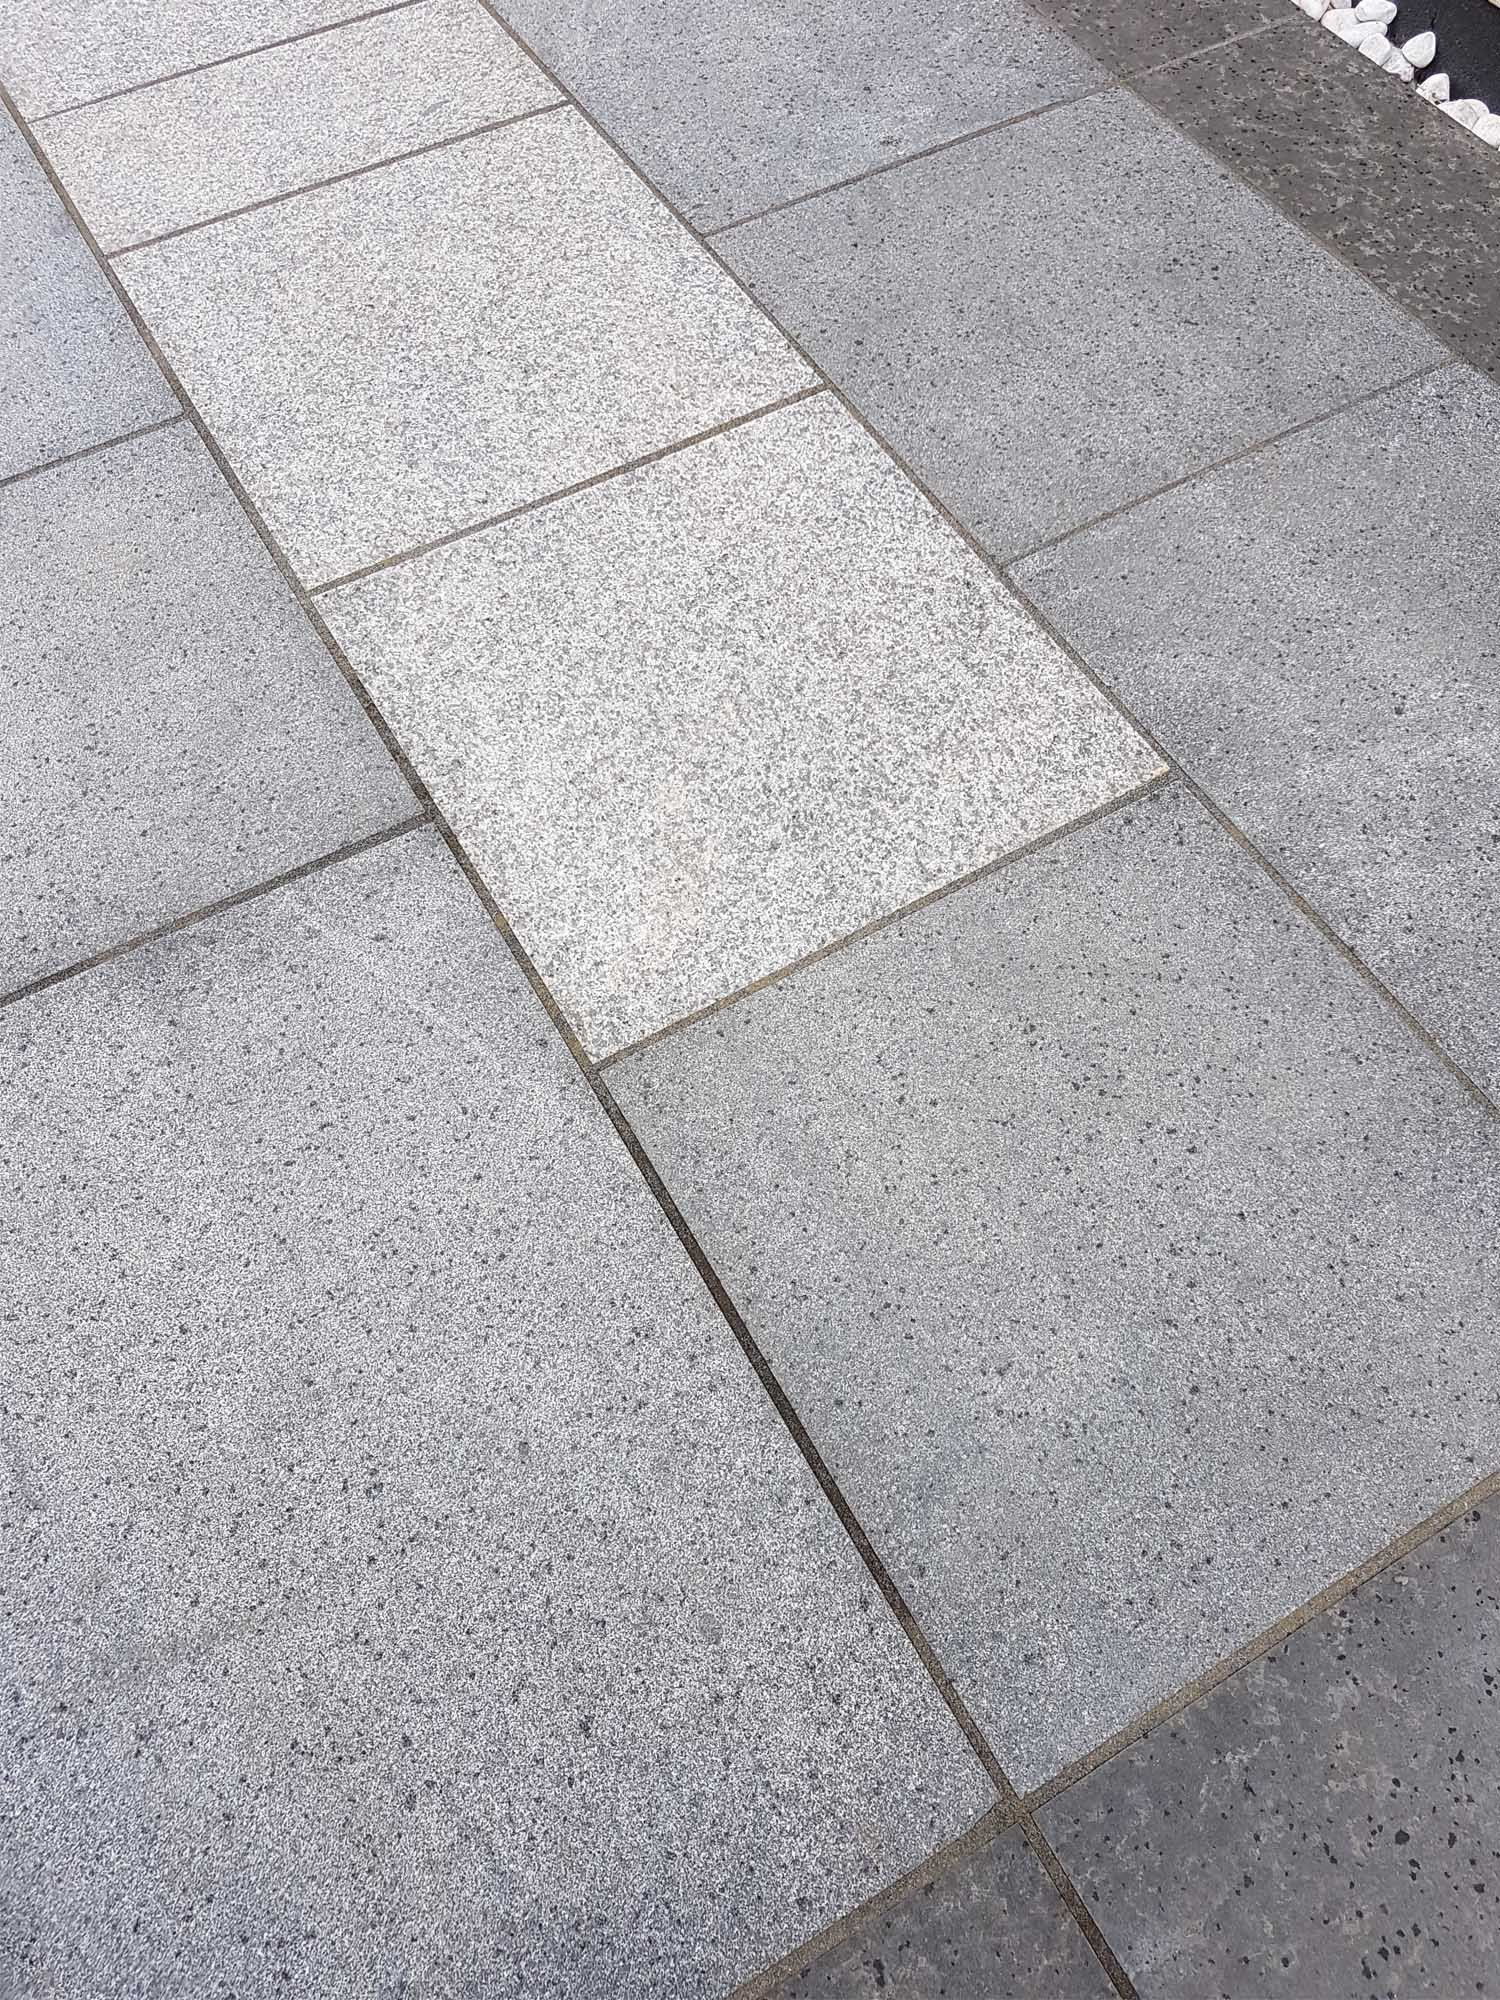 Gray Stone Slabs : Dark grey granite paving mid blue